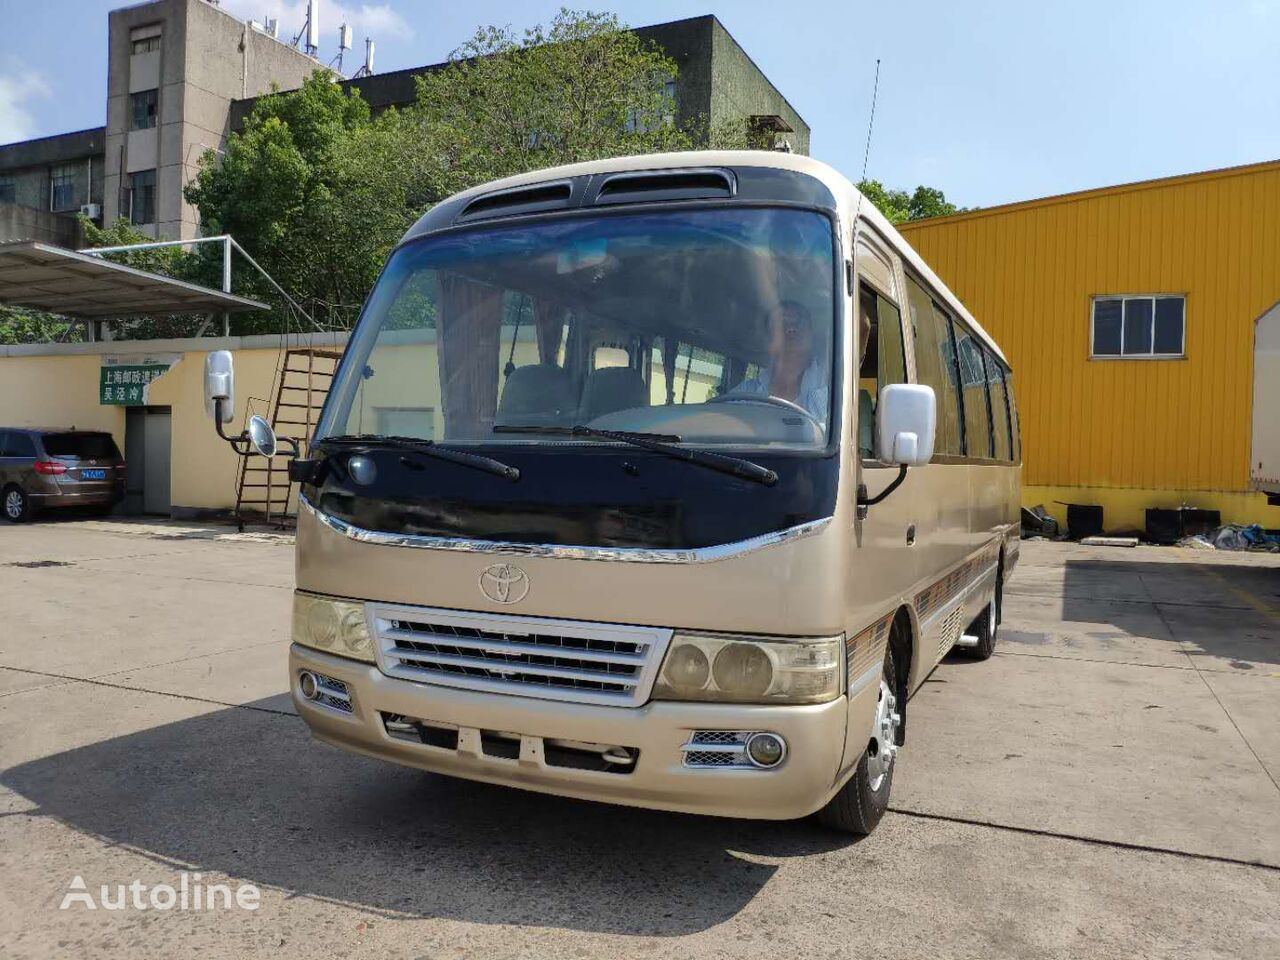 TOYOTA Coaster Bus 30 Seats with good condition autobús escolar